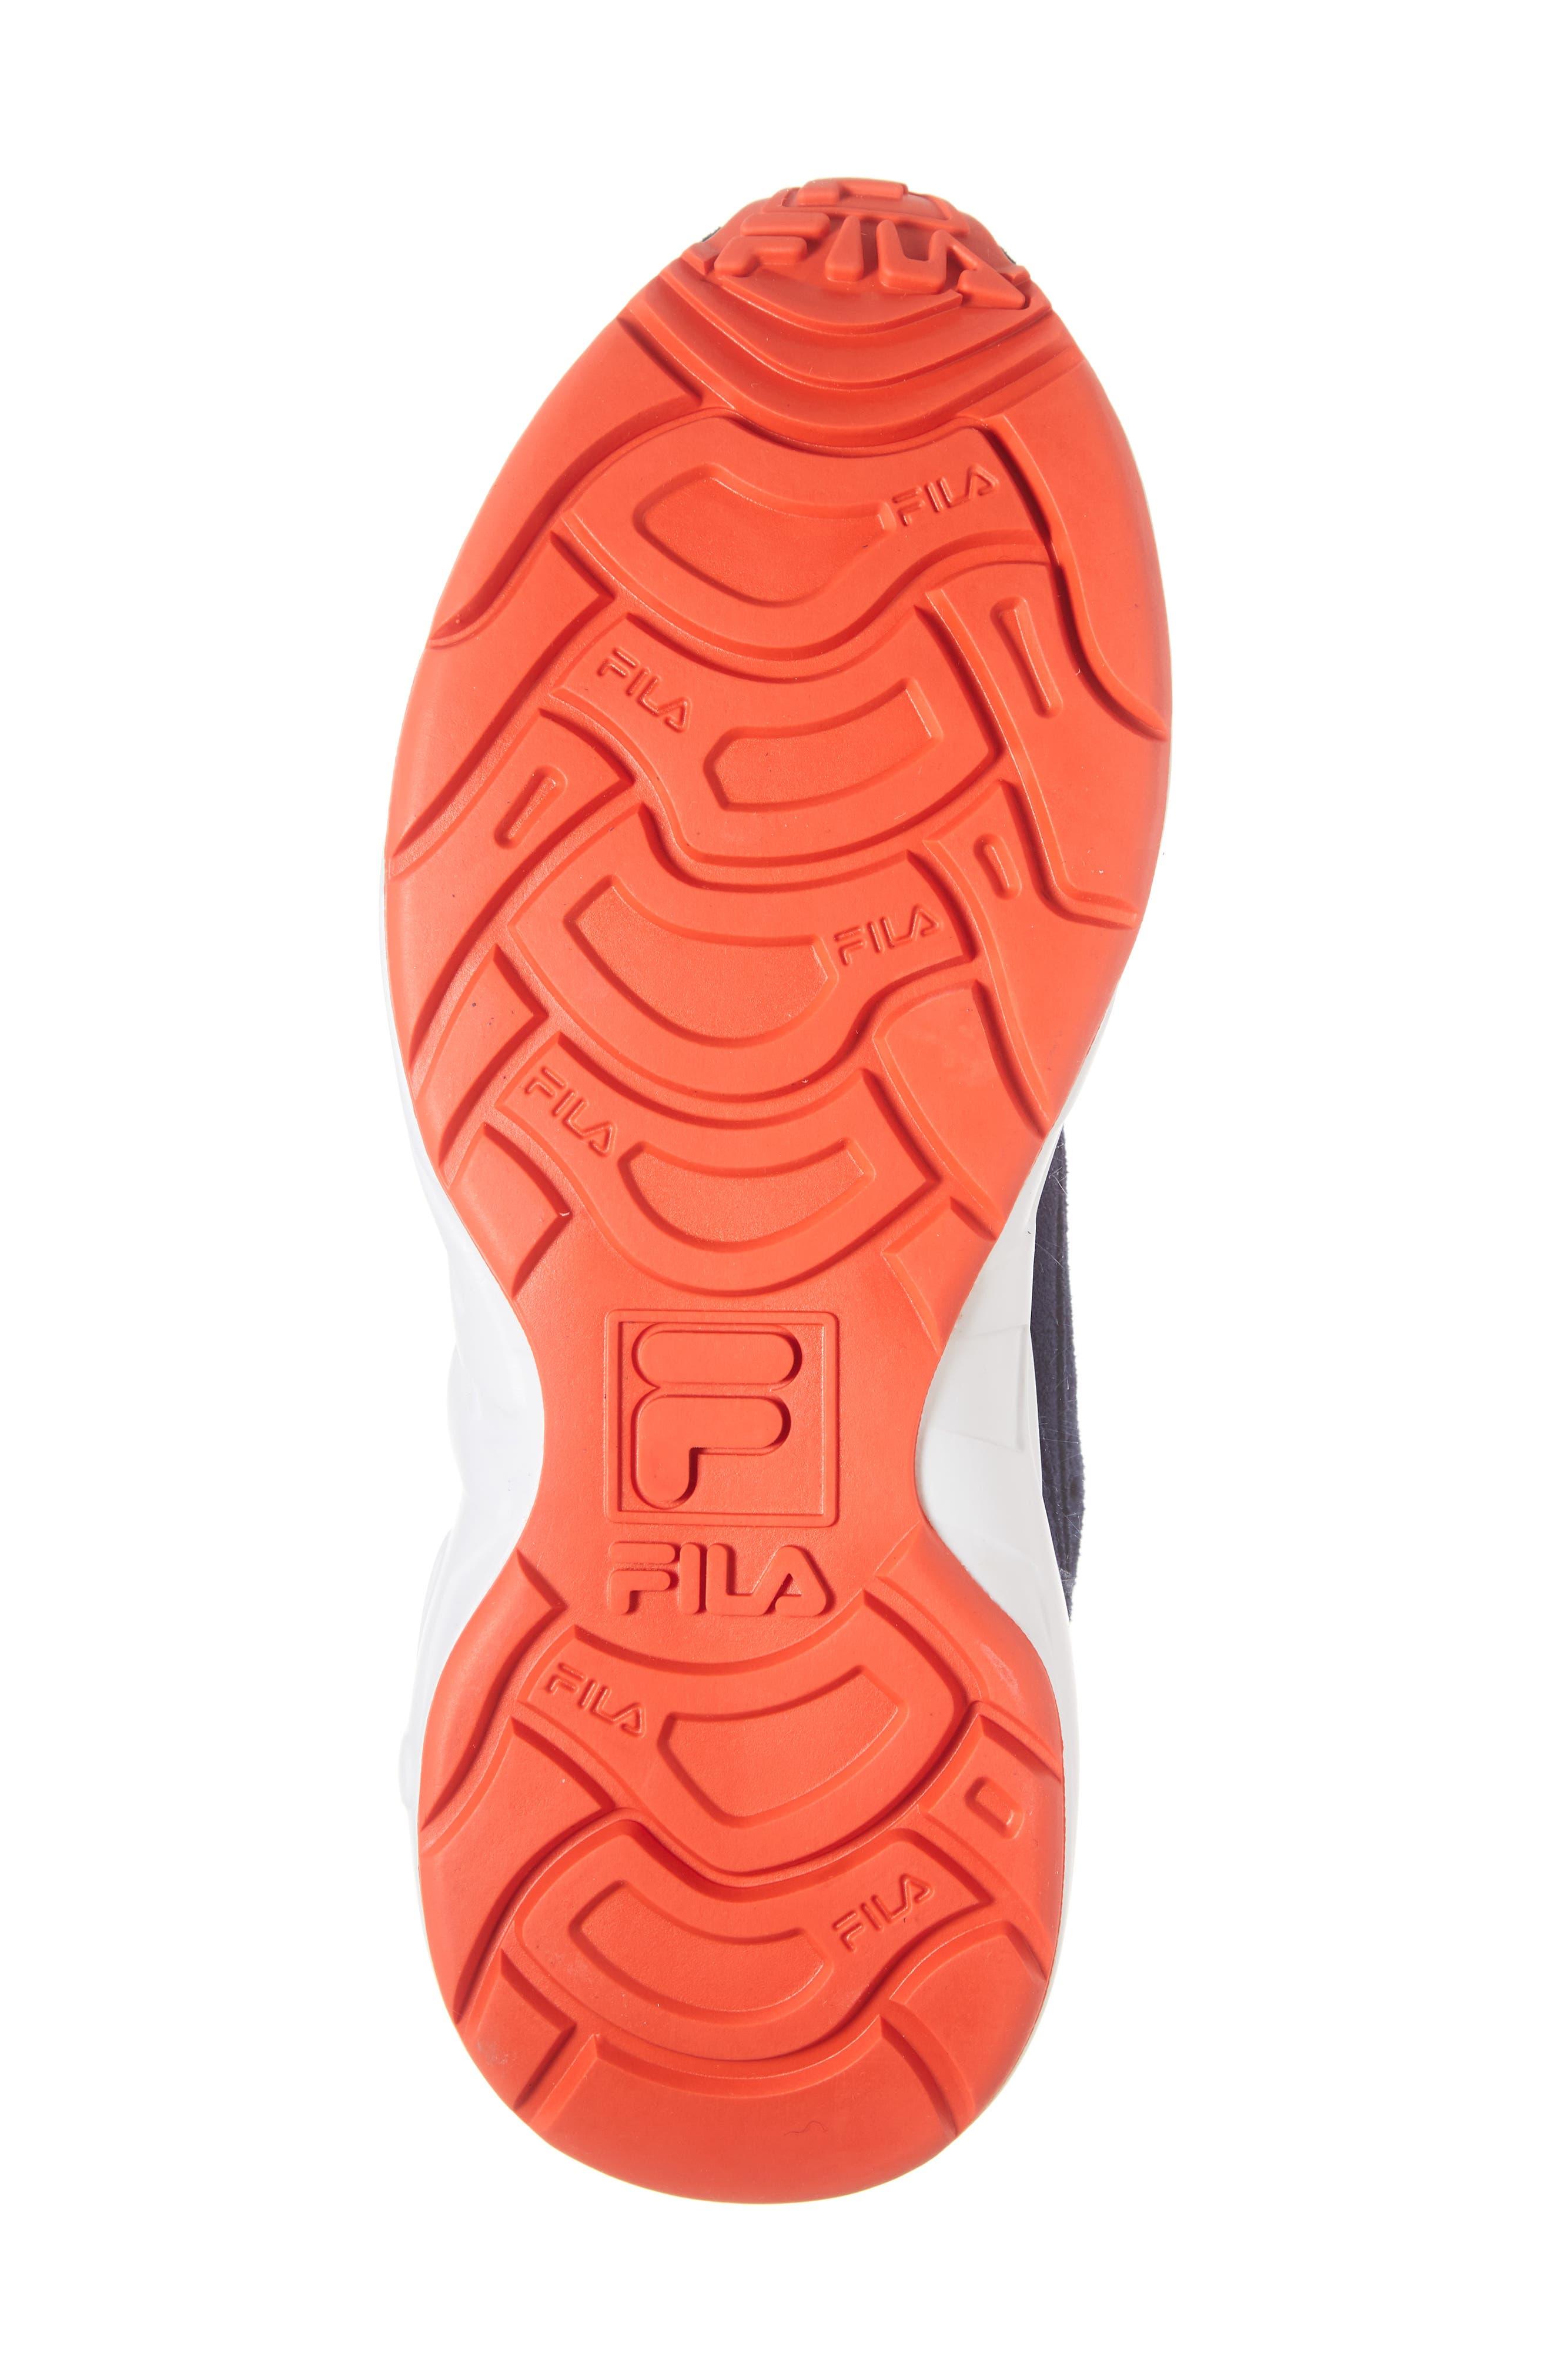 Mindblower Sneaker,                             Alternate thumbnail 6, color,                             NAVY/ WHITE/ RED